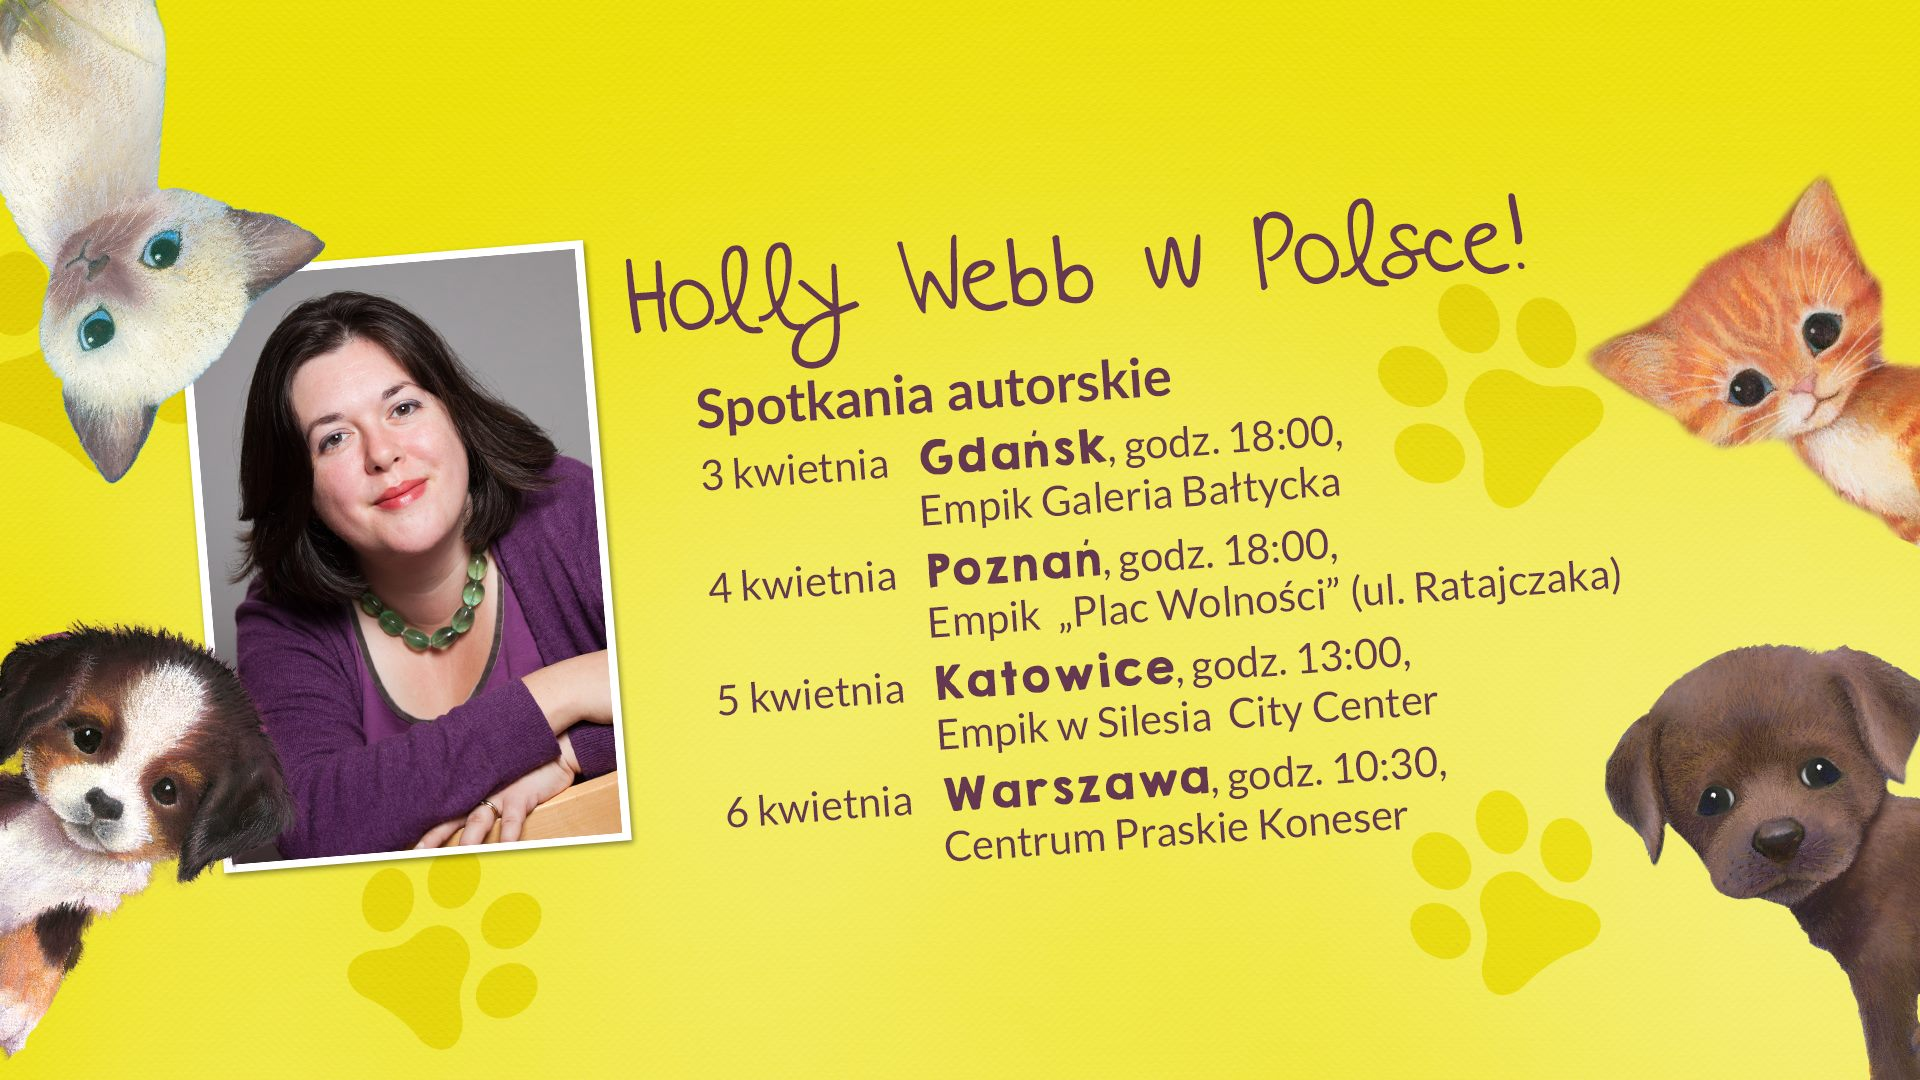 Spotkaj się z Holly Webb